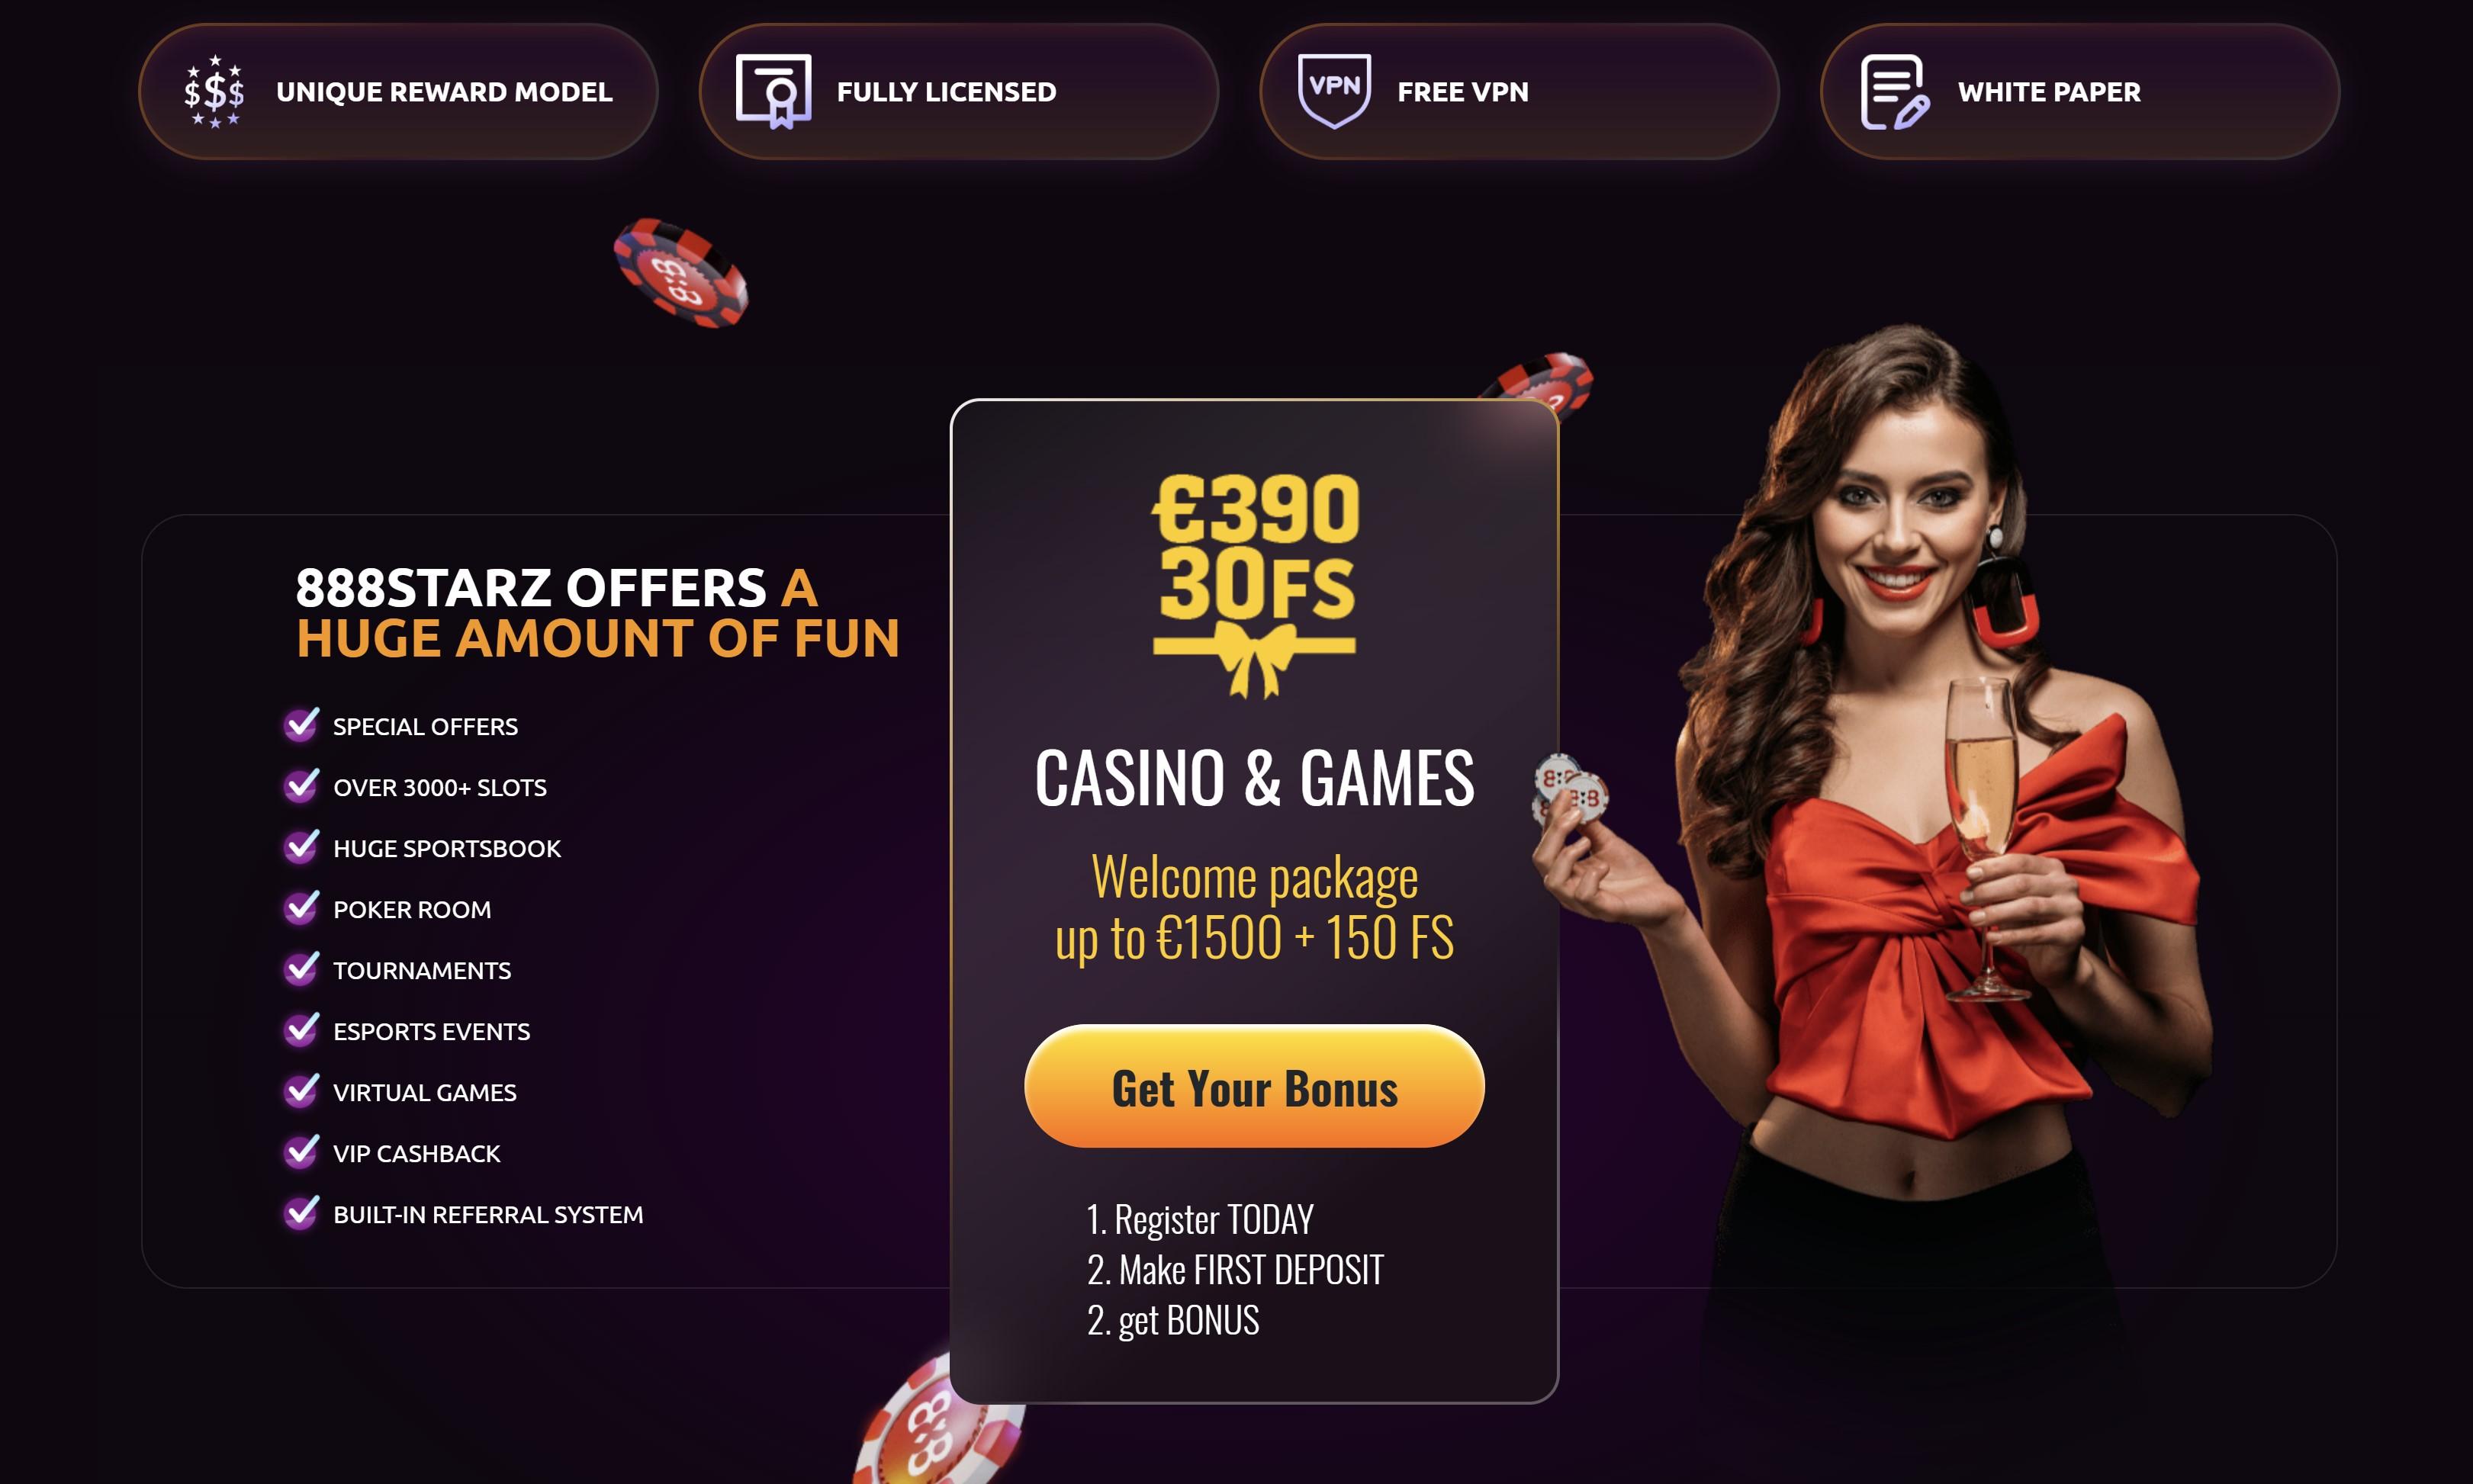 888starz casino bonus code 390€ kazino premija